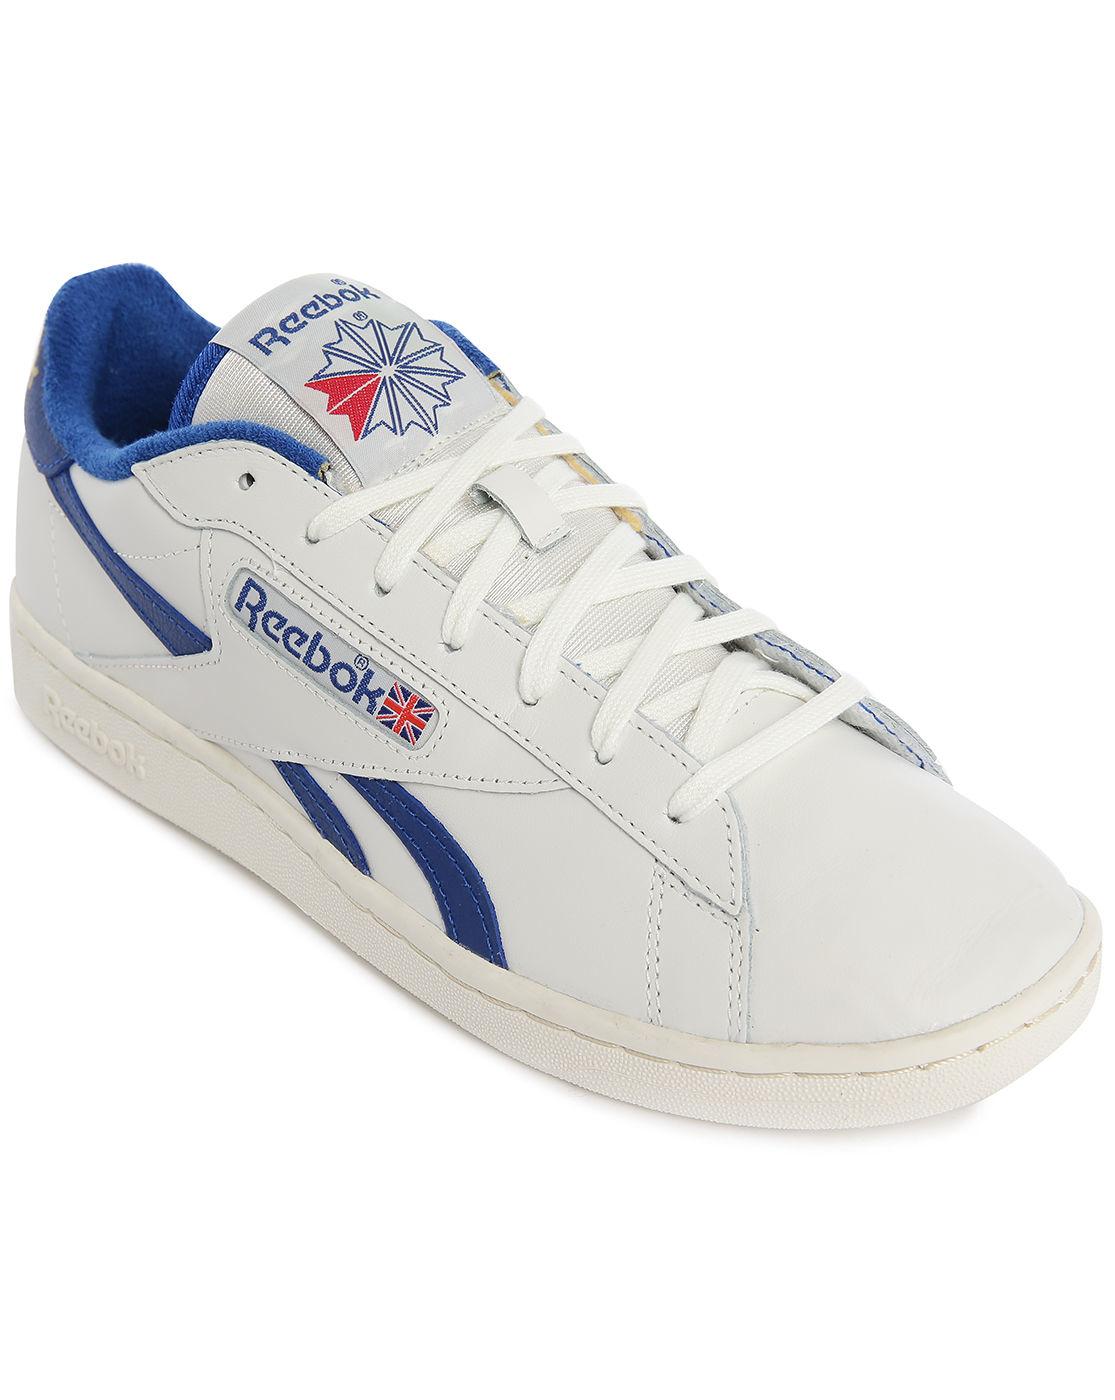 reebok npc uk white blue leather sneakers in blue for